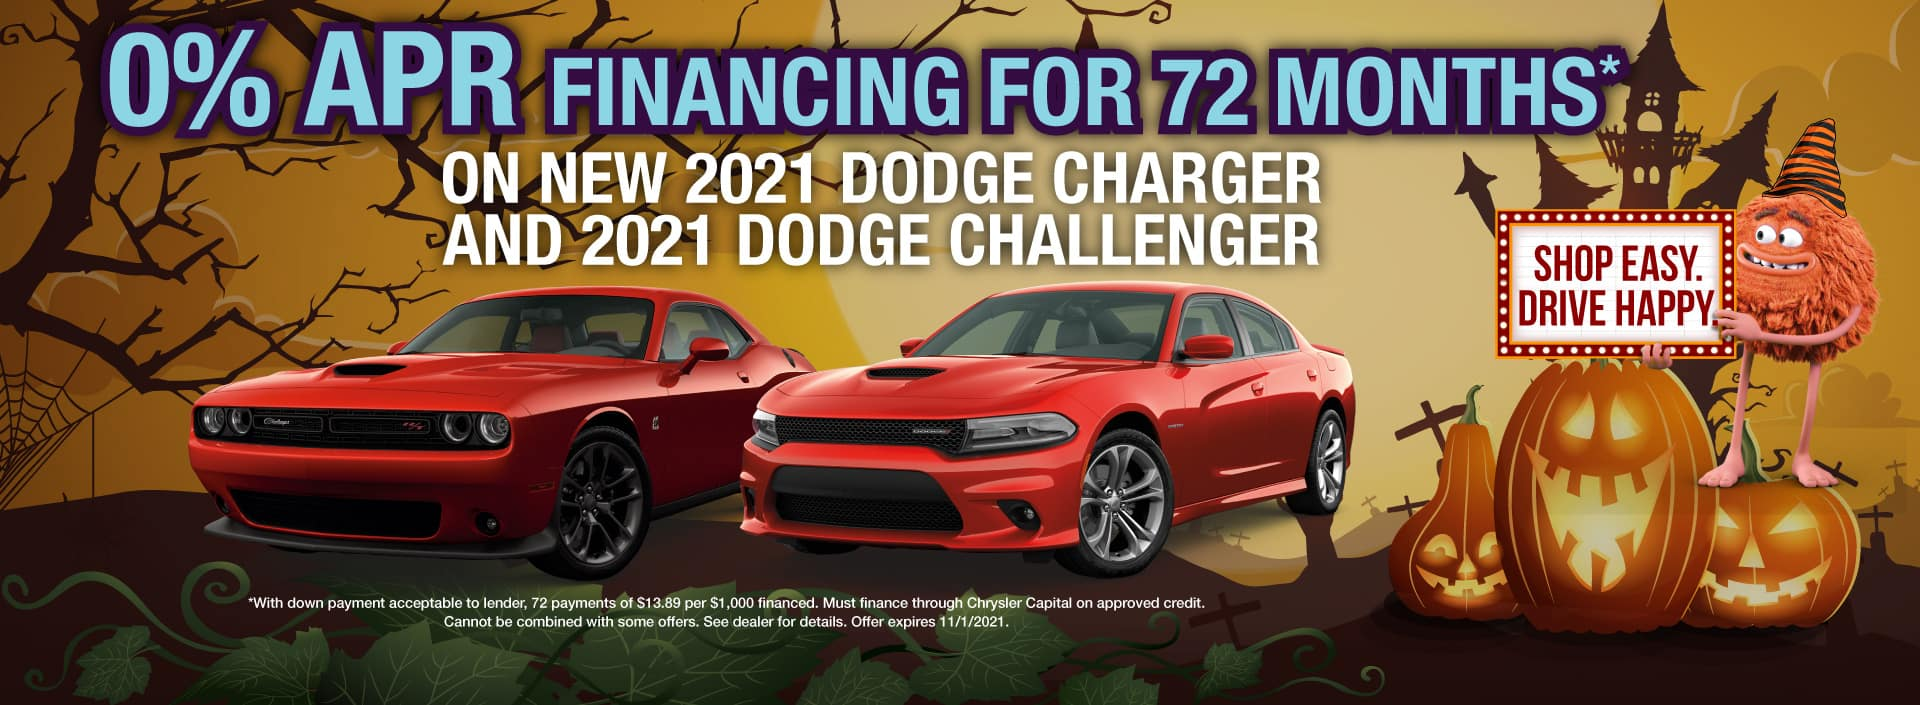 OC 1920px705 Offers_Oct31_0APR Dodge